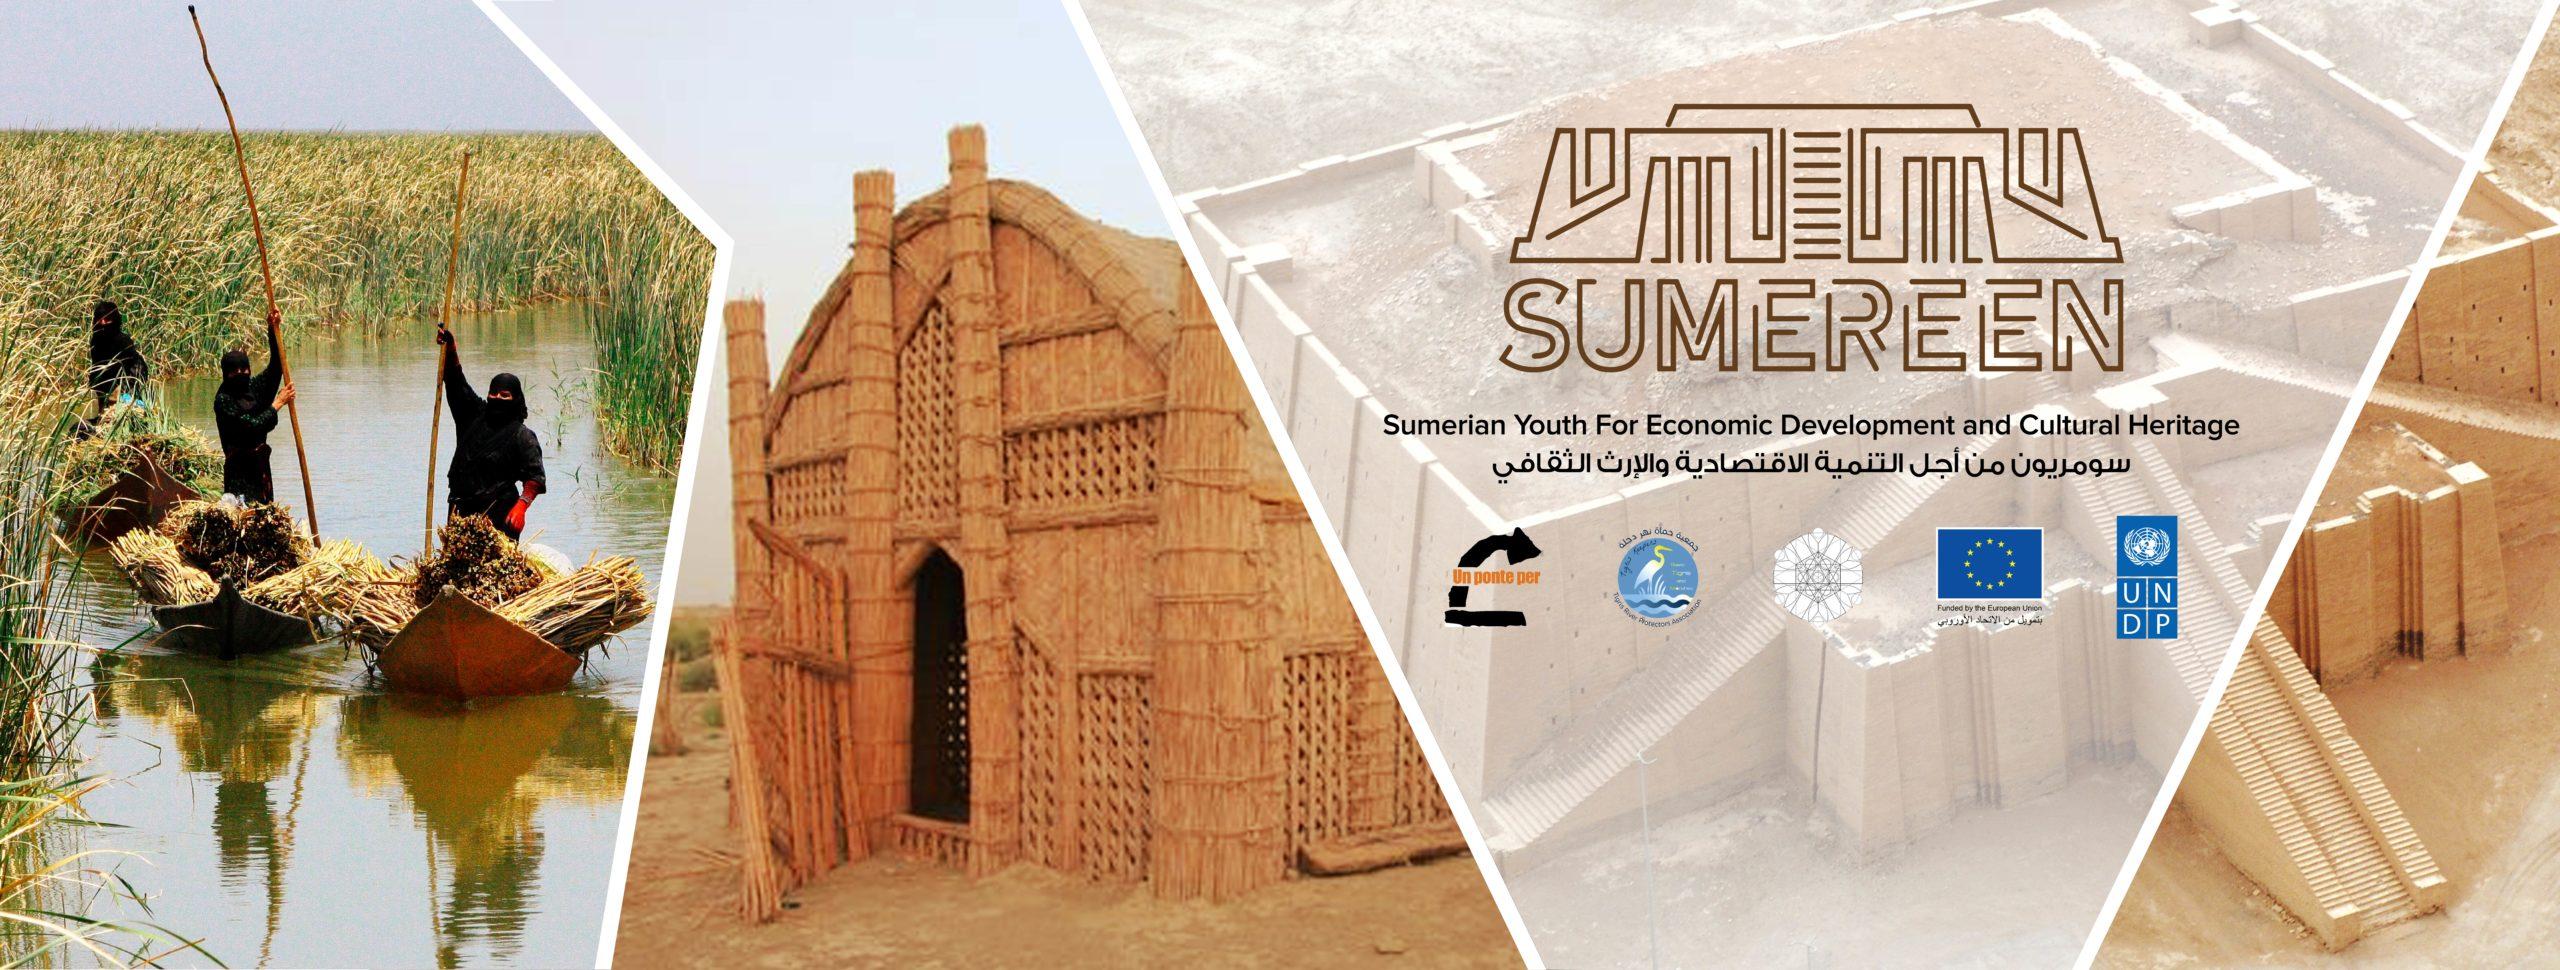 Launch of Sumereen: Socio-economic growth through eco-tourism in Thi Qar